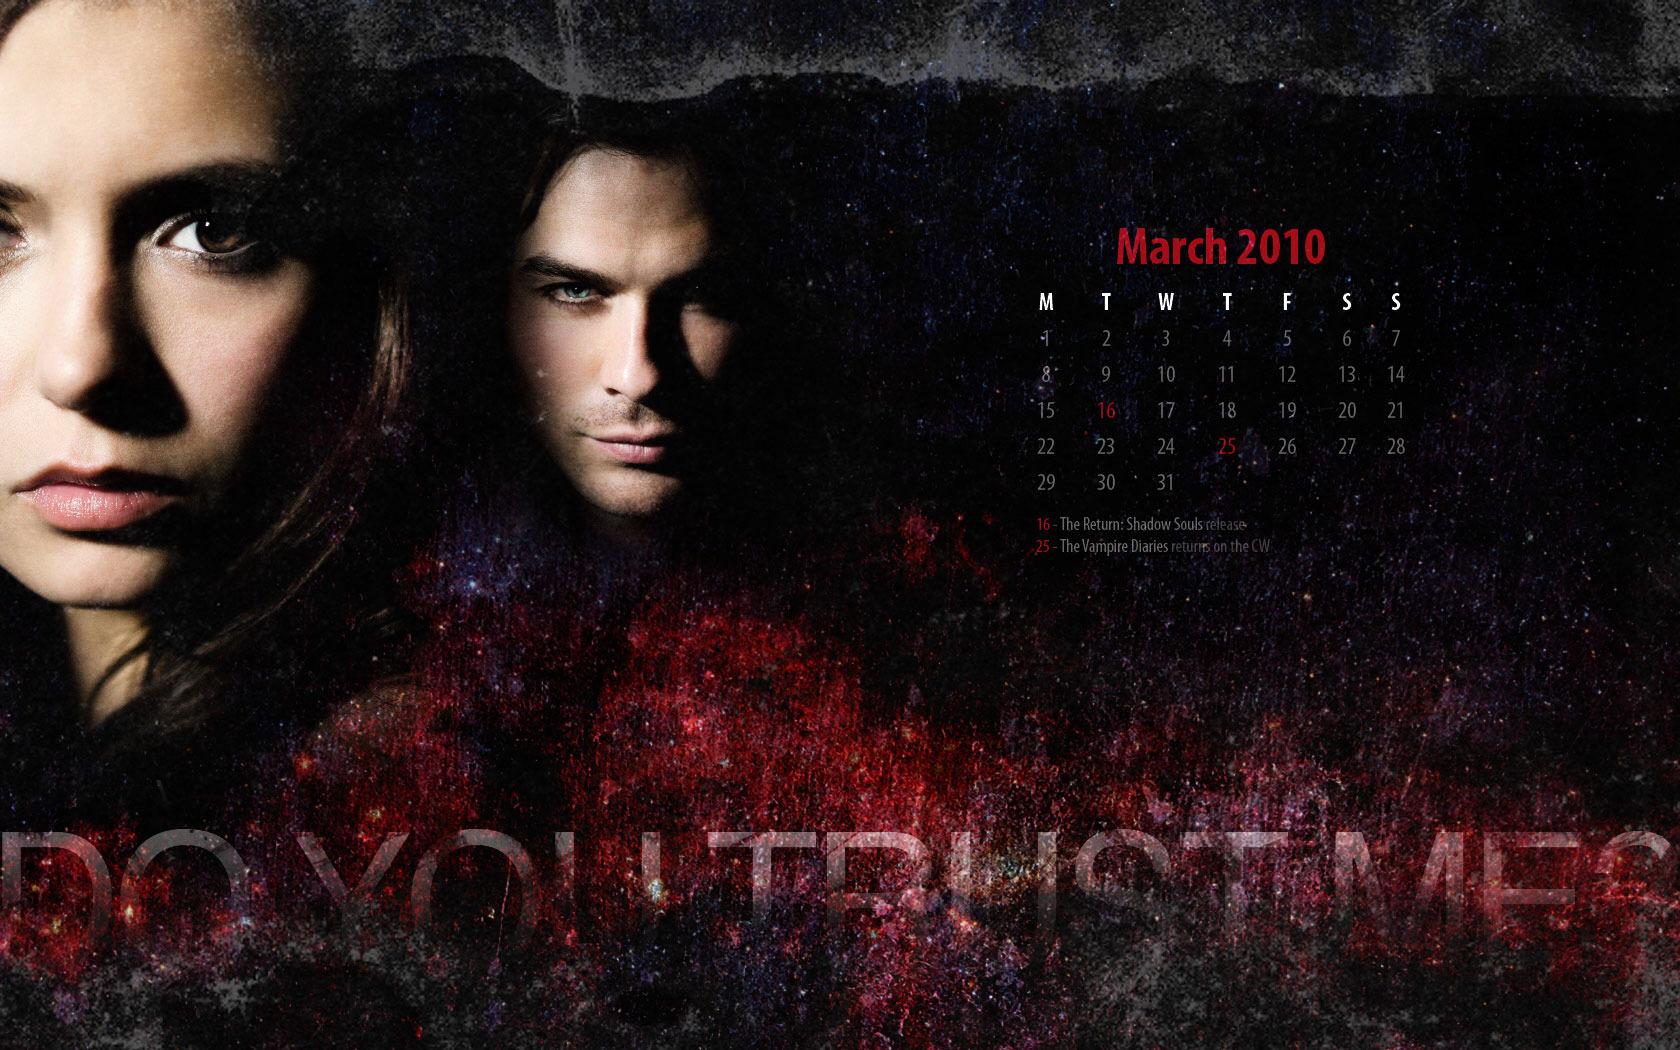 Damon and Elena Wallpaper   The Vampire Diaries TV Show 1680x1050